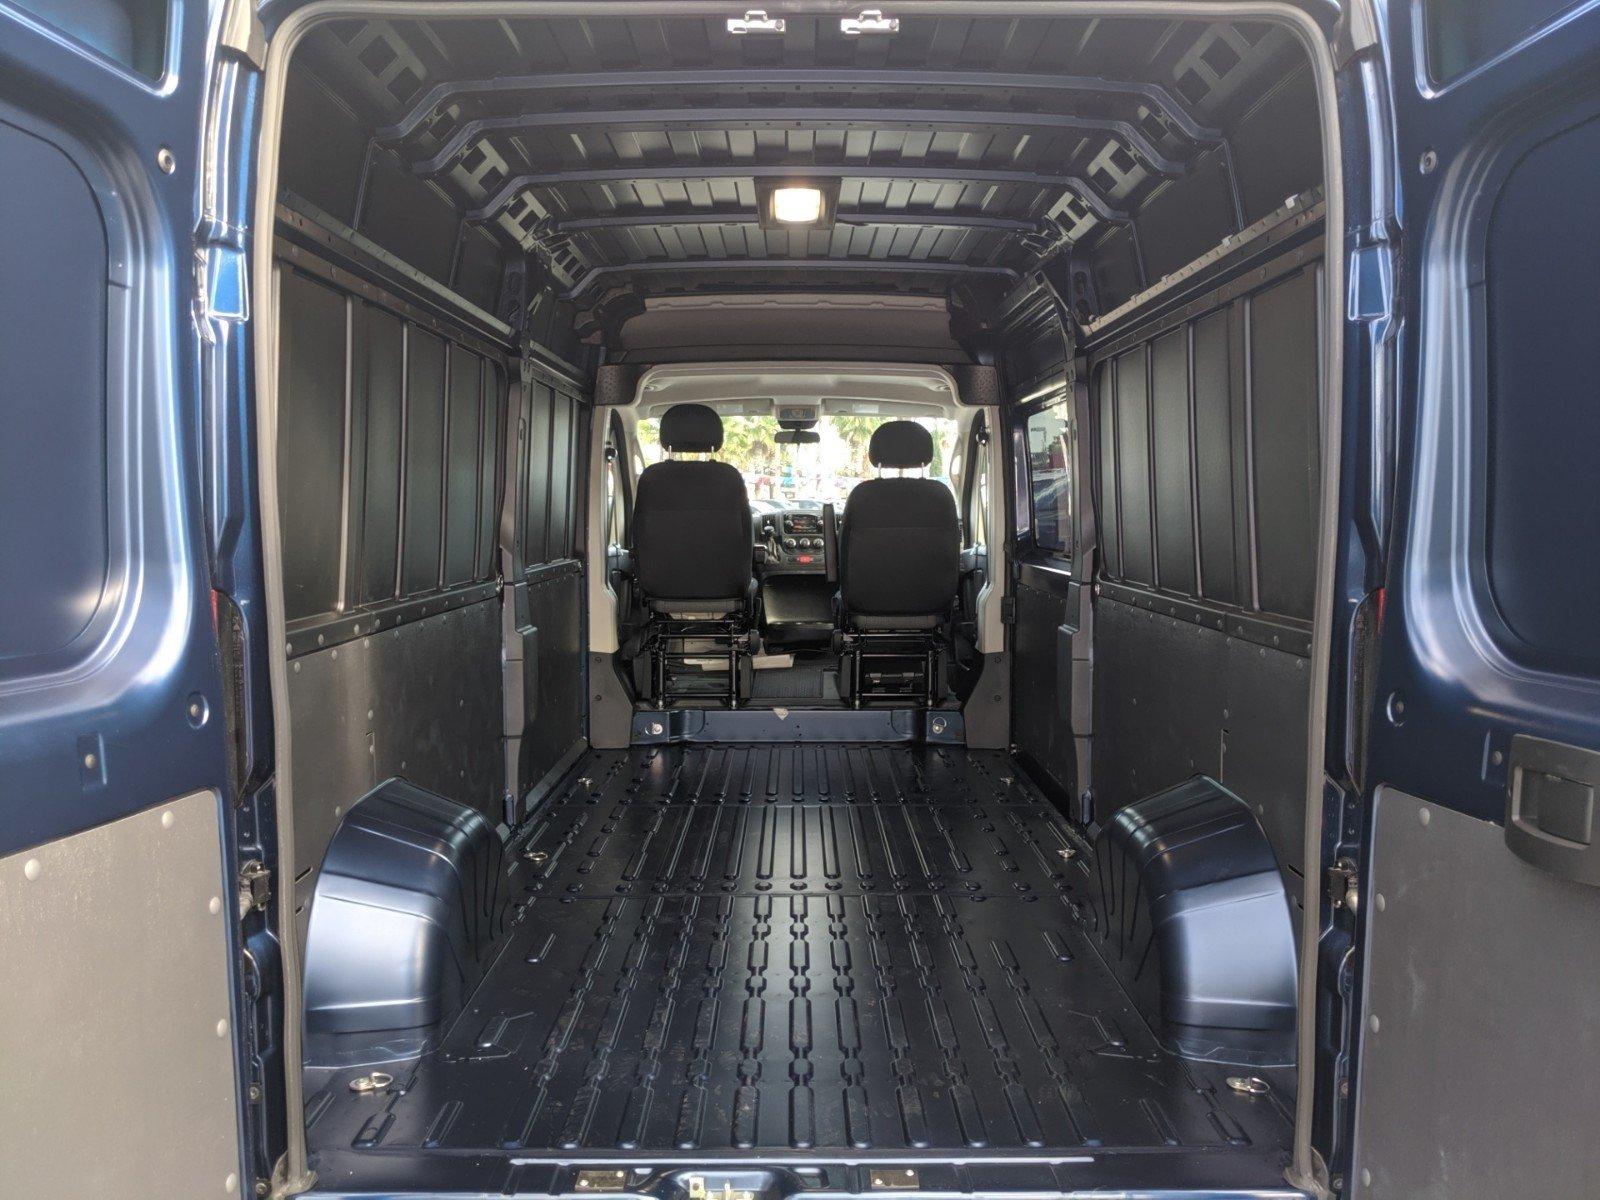 2020 Ram ProMaster 2500 High Roof FWD, Empty Cargo Van #R20144 - photo 1